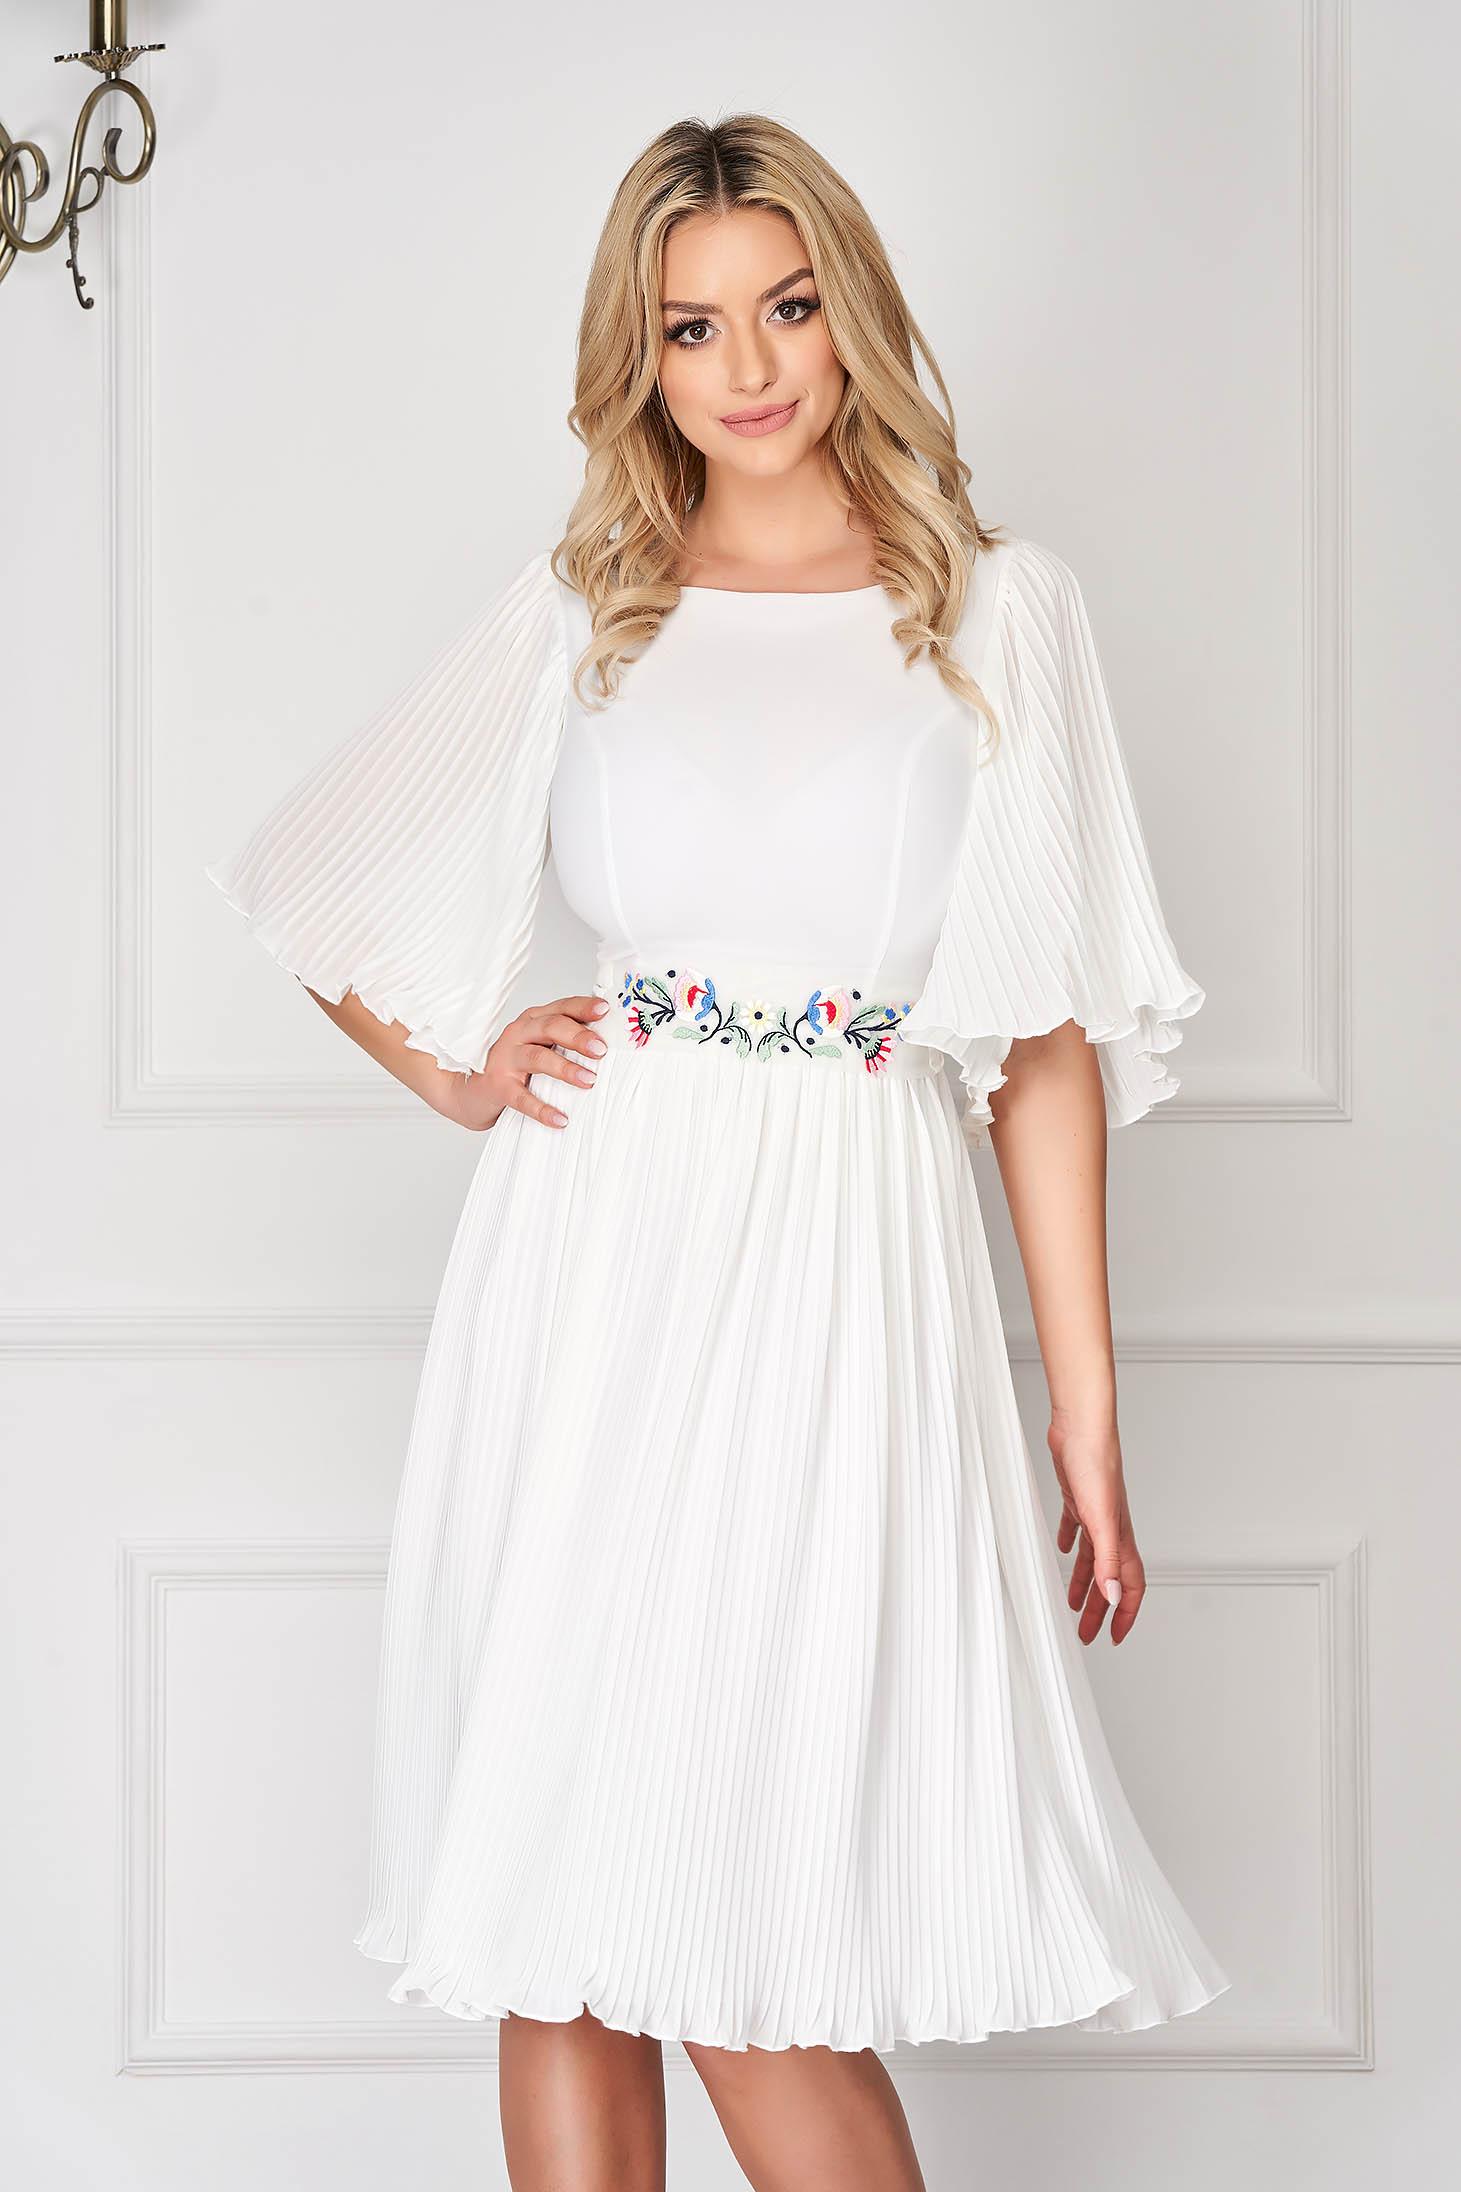 Dress StarShinerS white elegant midi from veil fabric folded up detachable cord